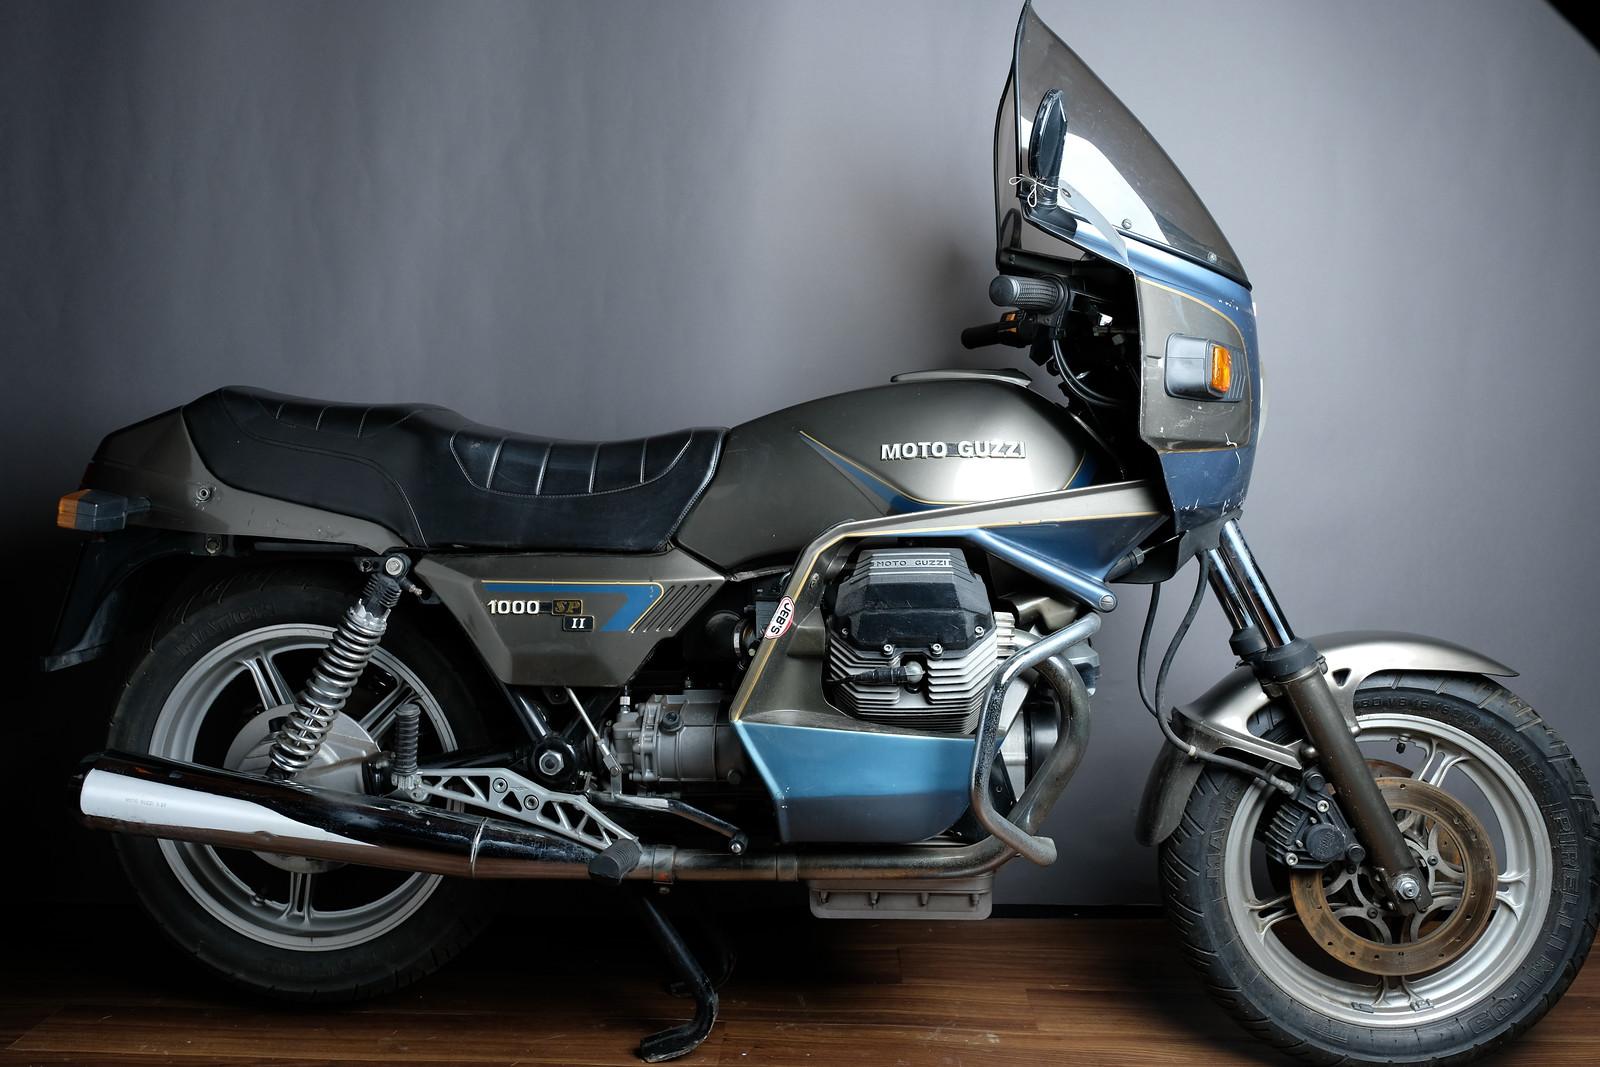 Moto Guzzi 1000 SP 2